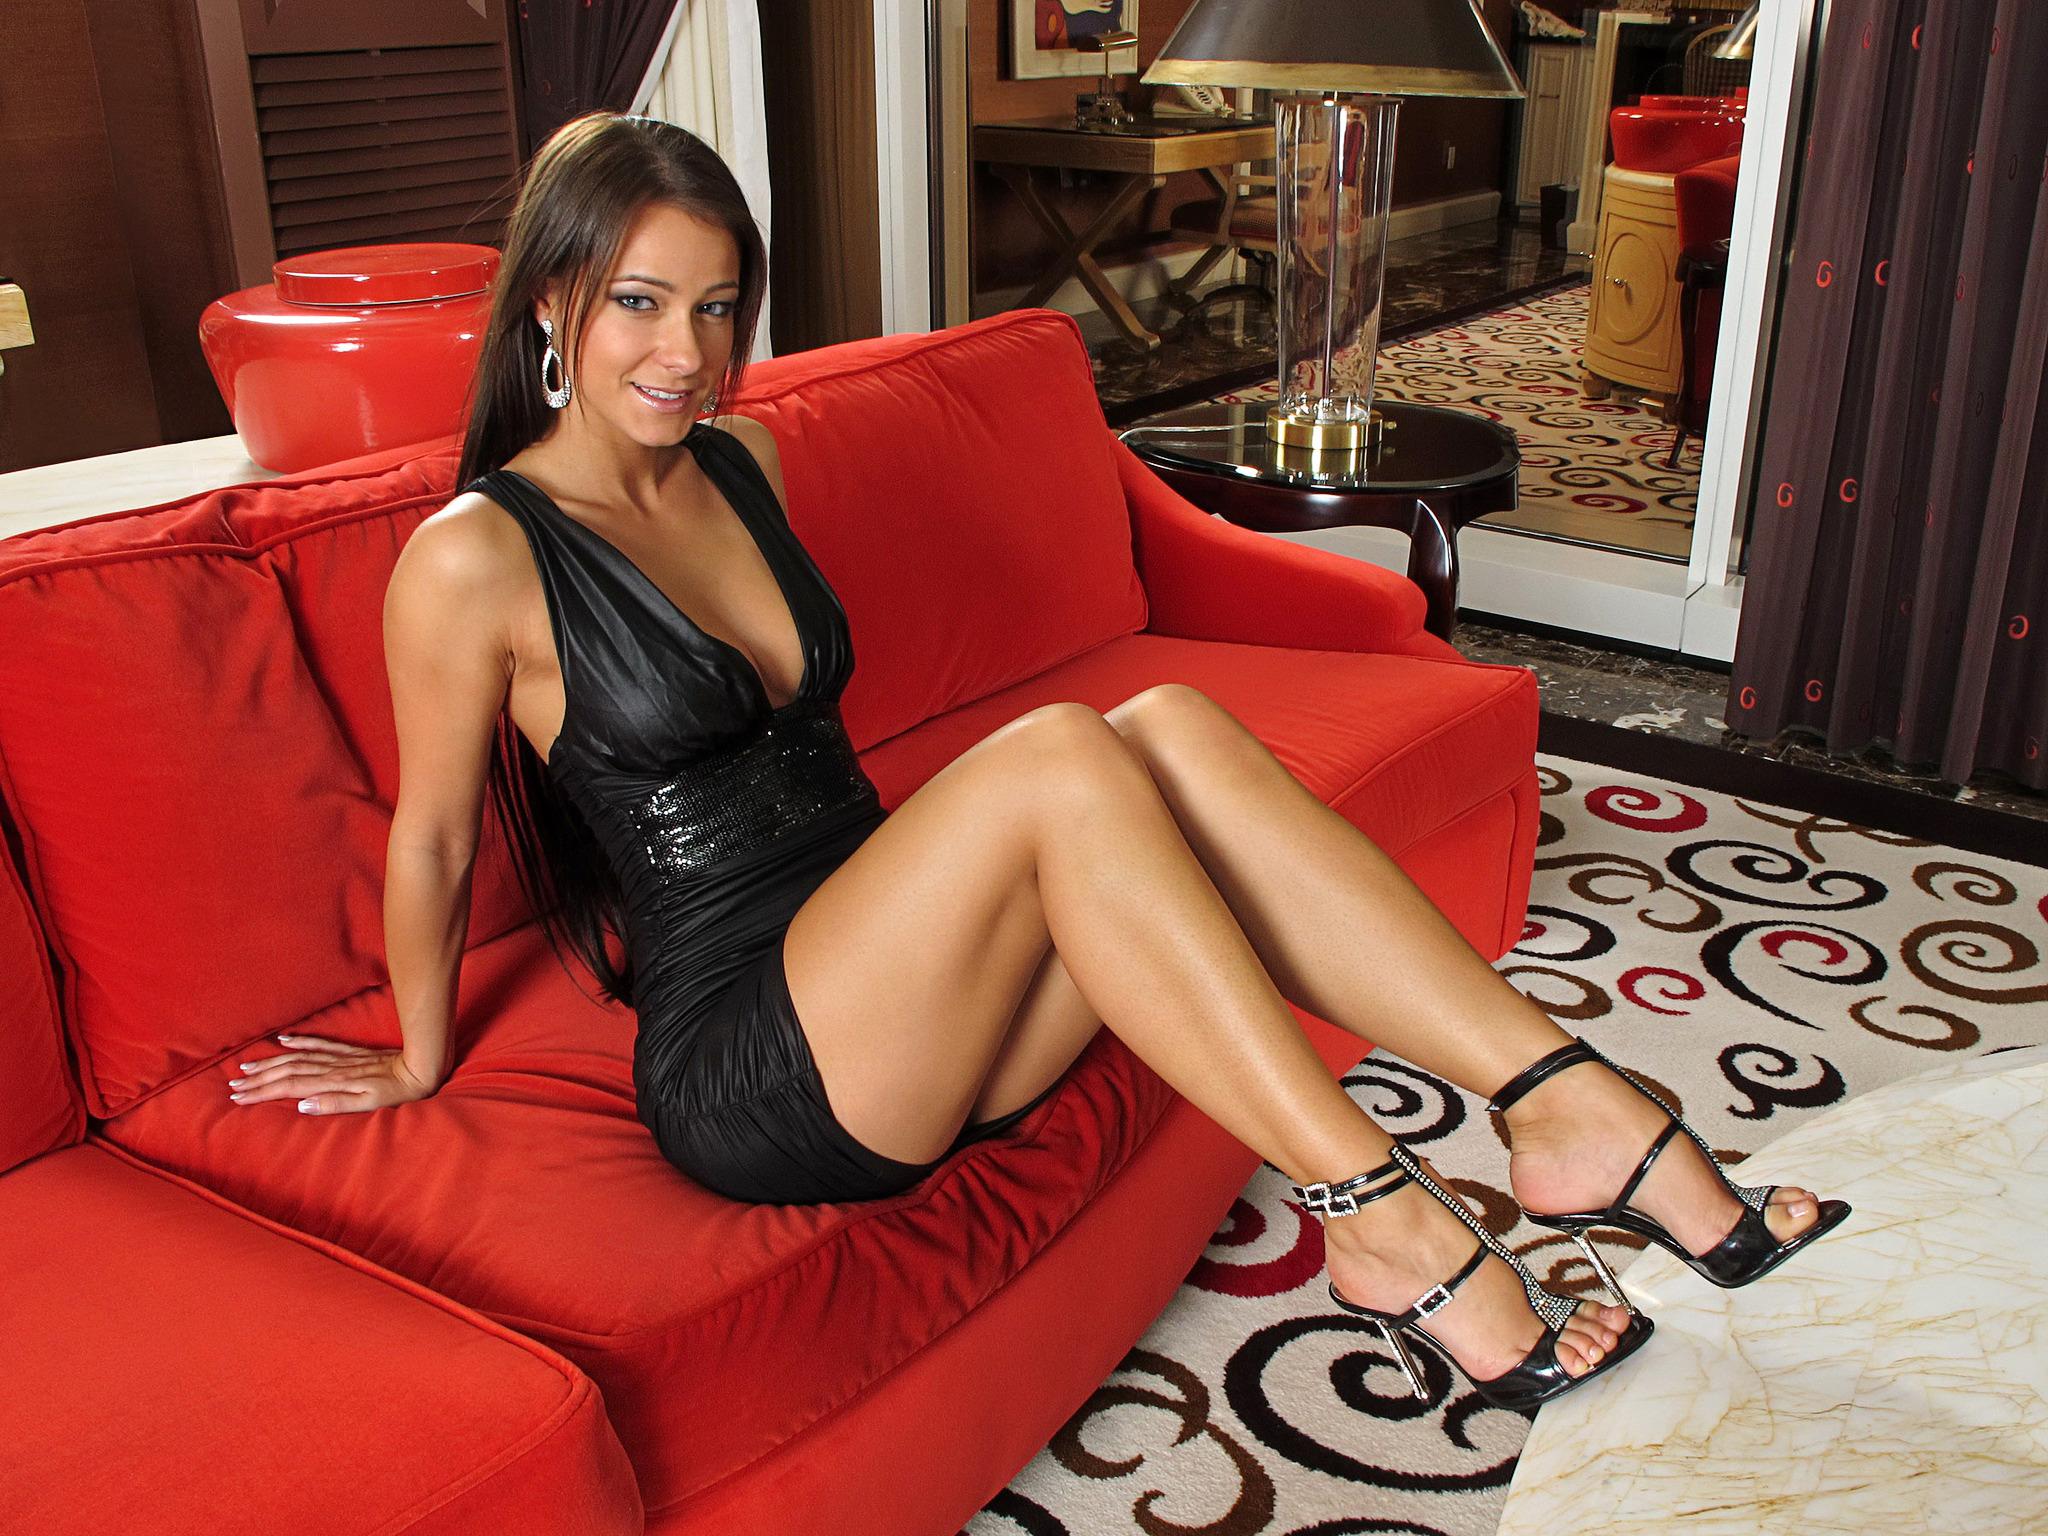 Kristina black and webcam babe